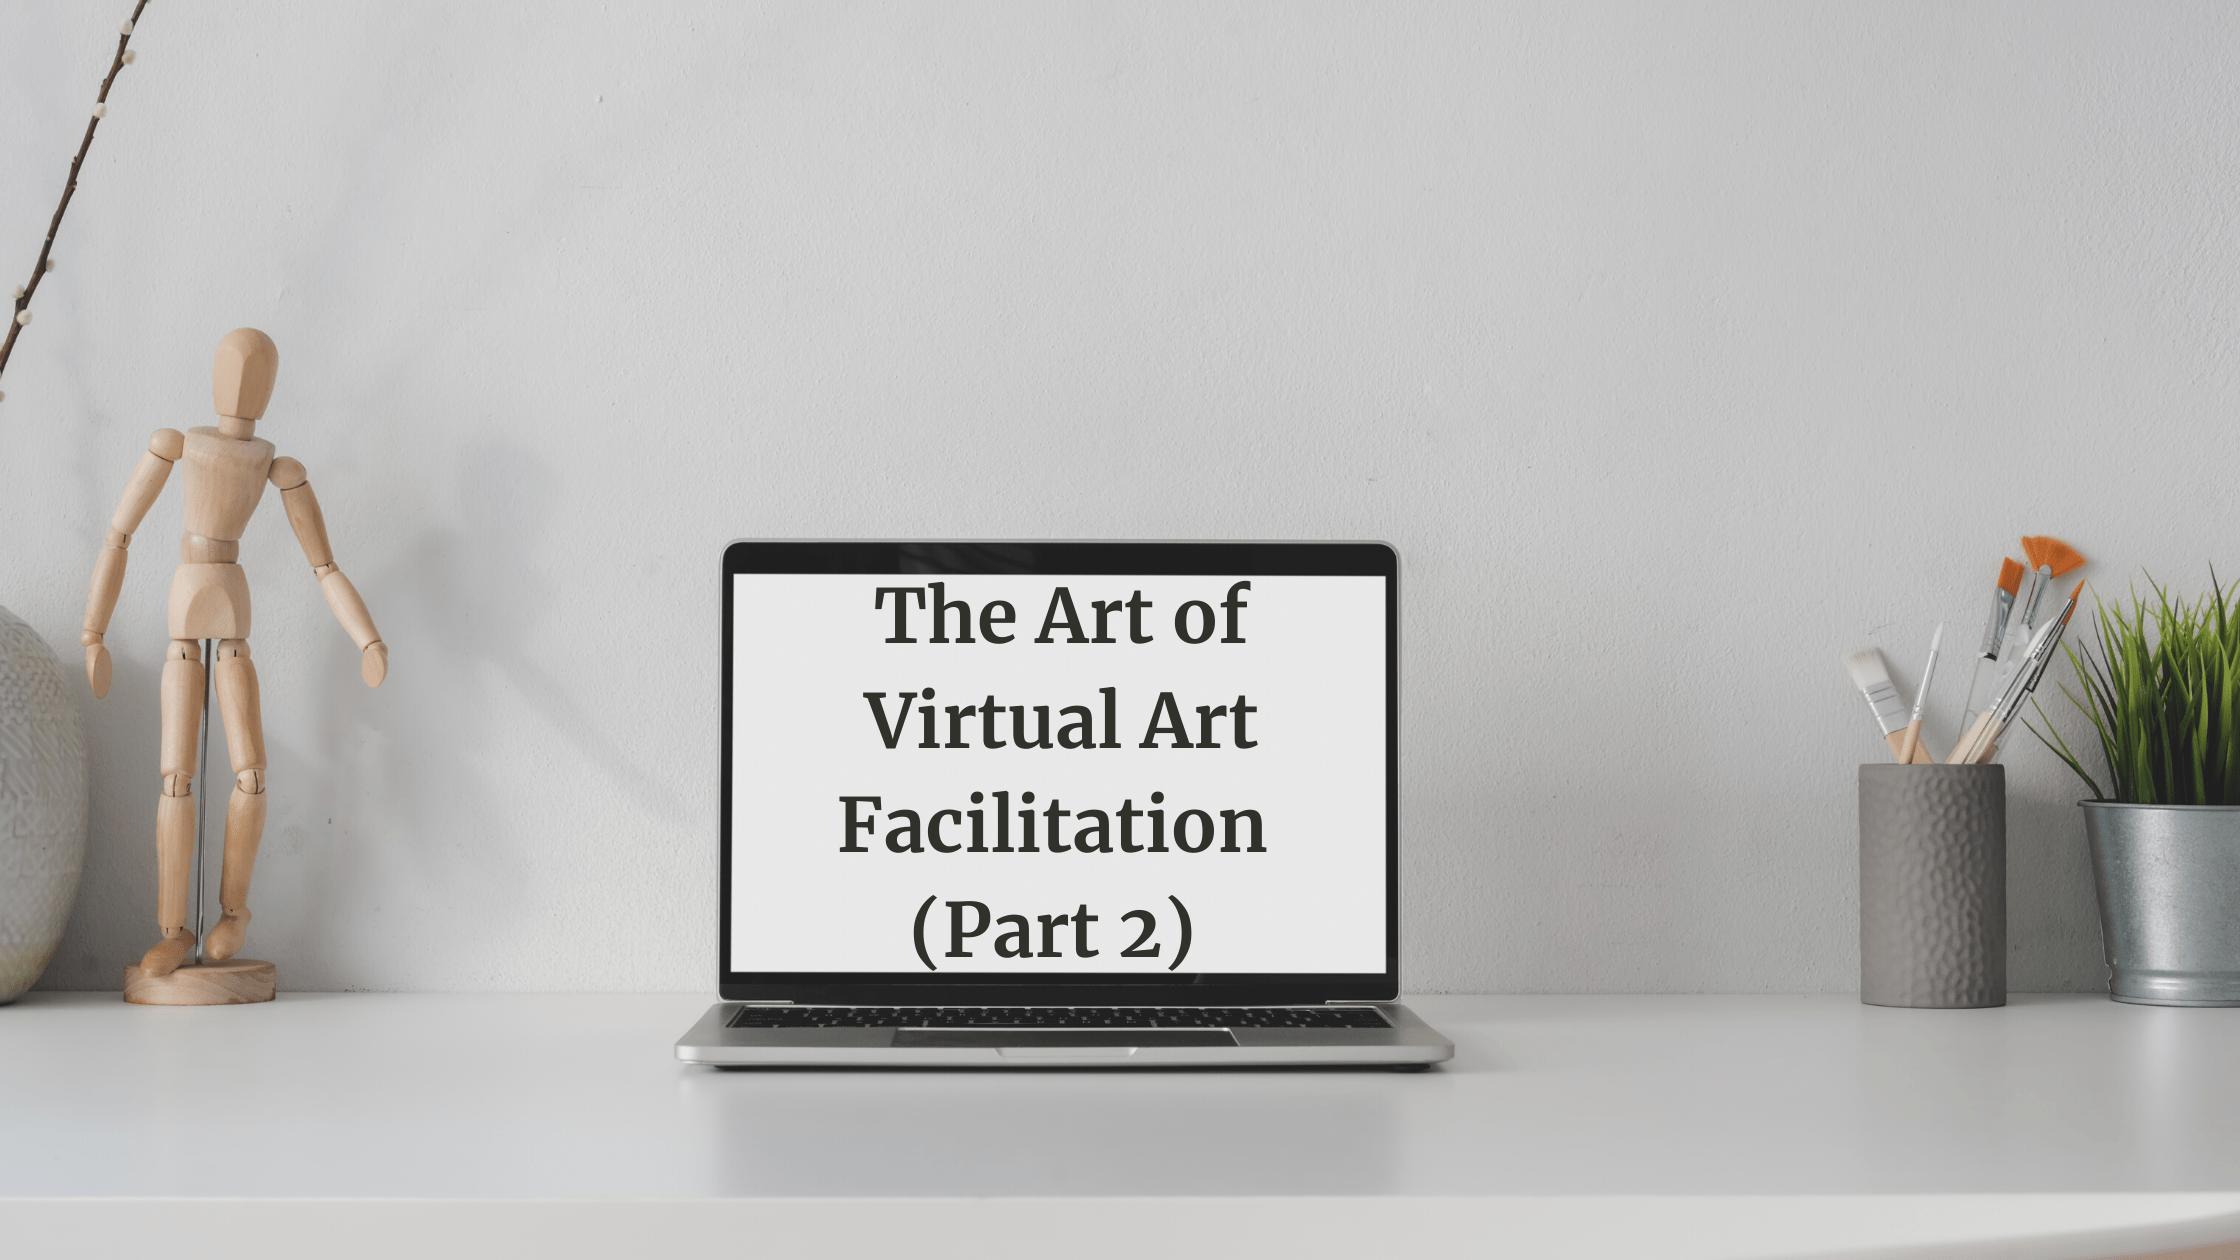 The Art of Virtual Art Facilitation Part 2